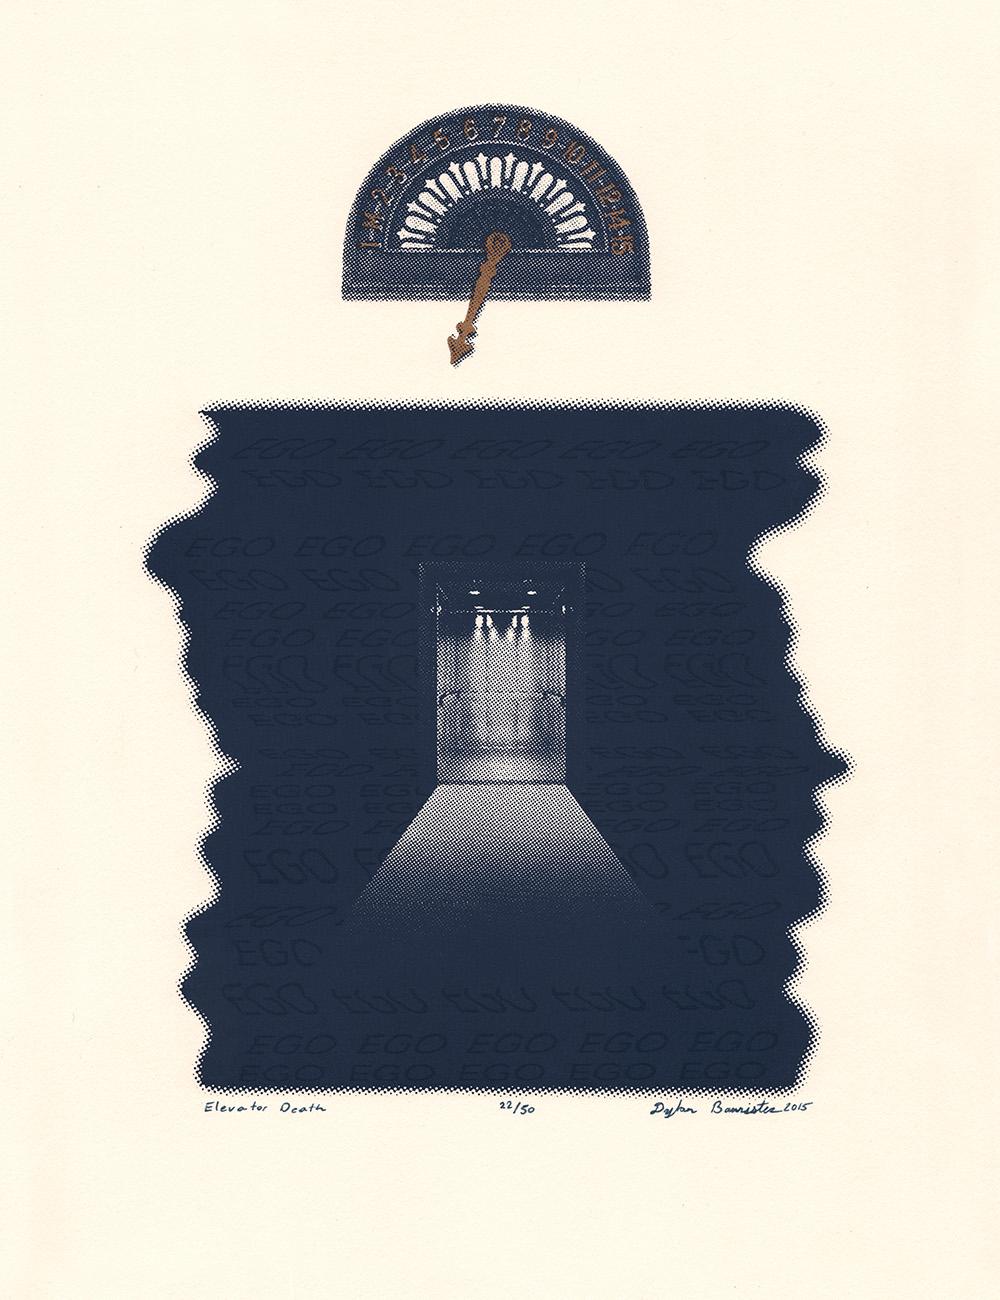 "<i>Elevator Death</i><br>Silkscreen Print<br>10"" x 13""<br>2015"